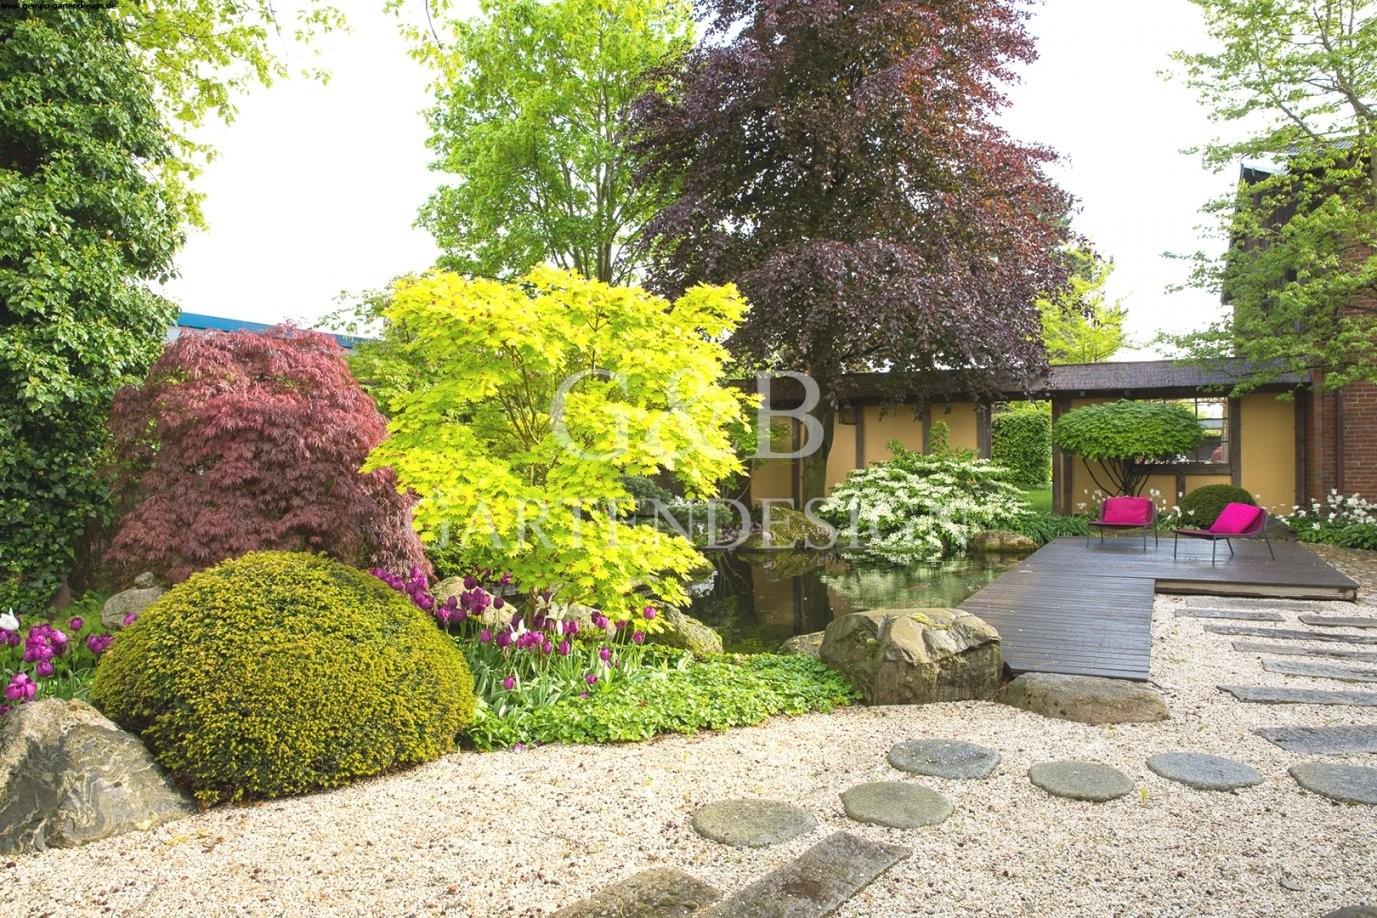 Pflanzen Japanischer Garten Anlegen  Haus Ideen von Pflanzen Japanischer Garten Anlegen Photo